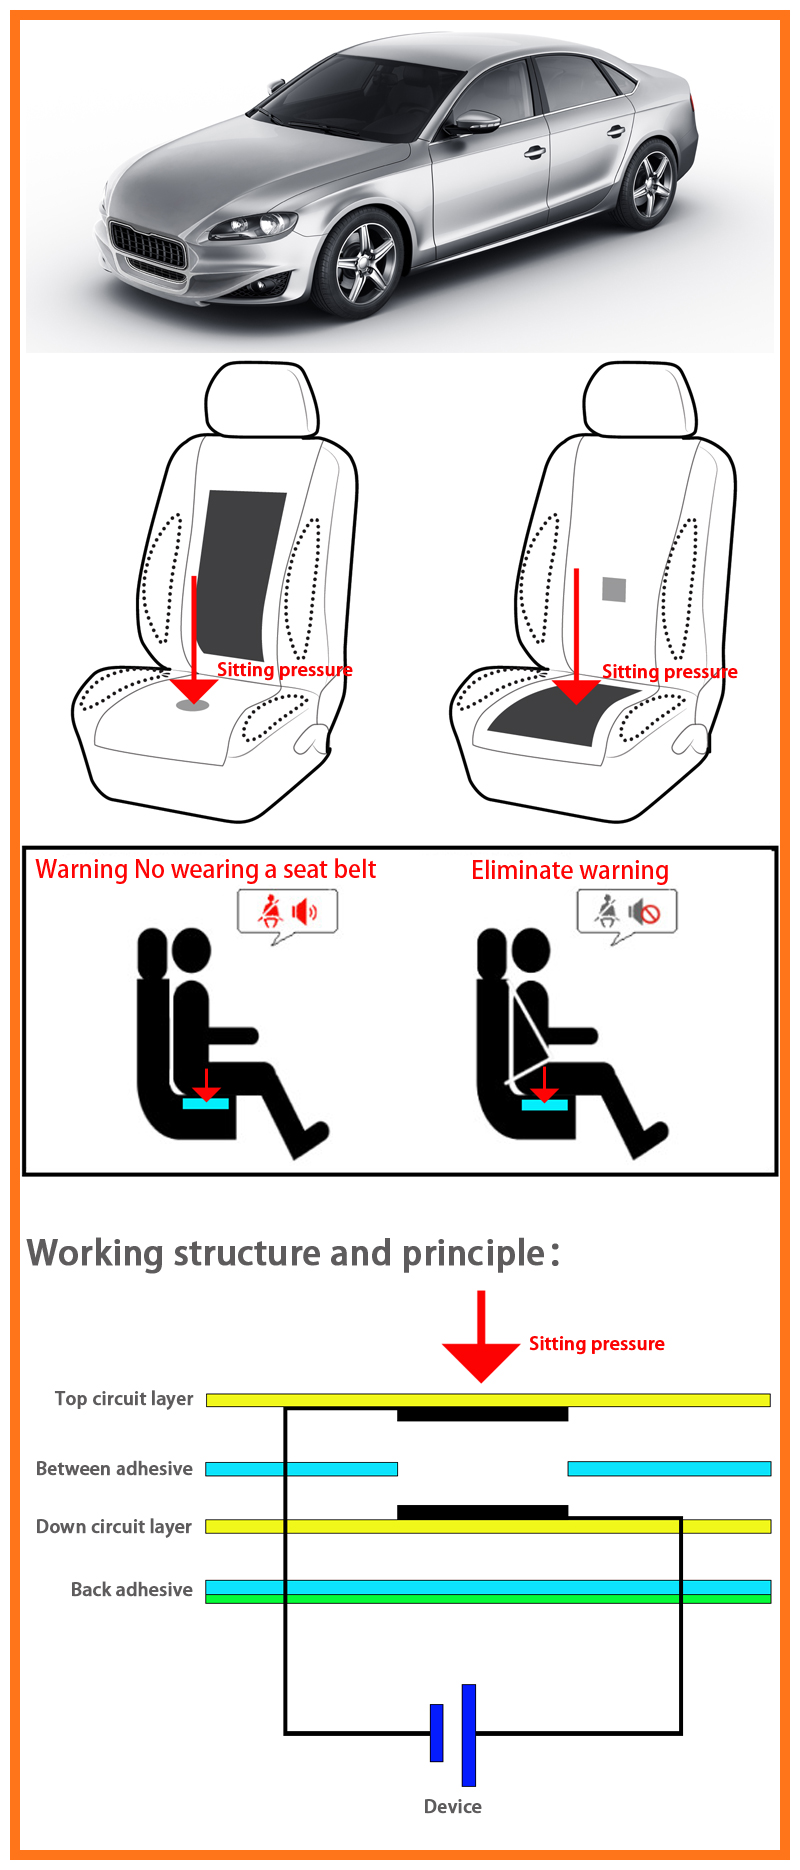 Child Seat Alarm Reminder In Car Alarm Sensor For Safety Thin Film Membrane  Gravity Weight Pressure Sensor - Buy Car Safety Pressure Sensor,Seat